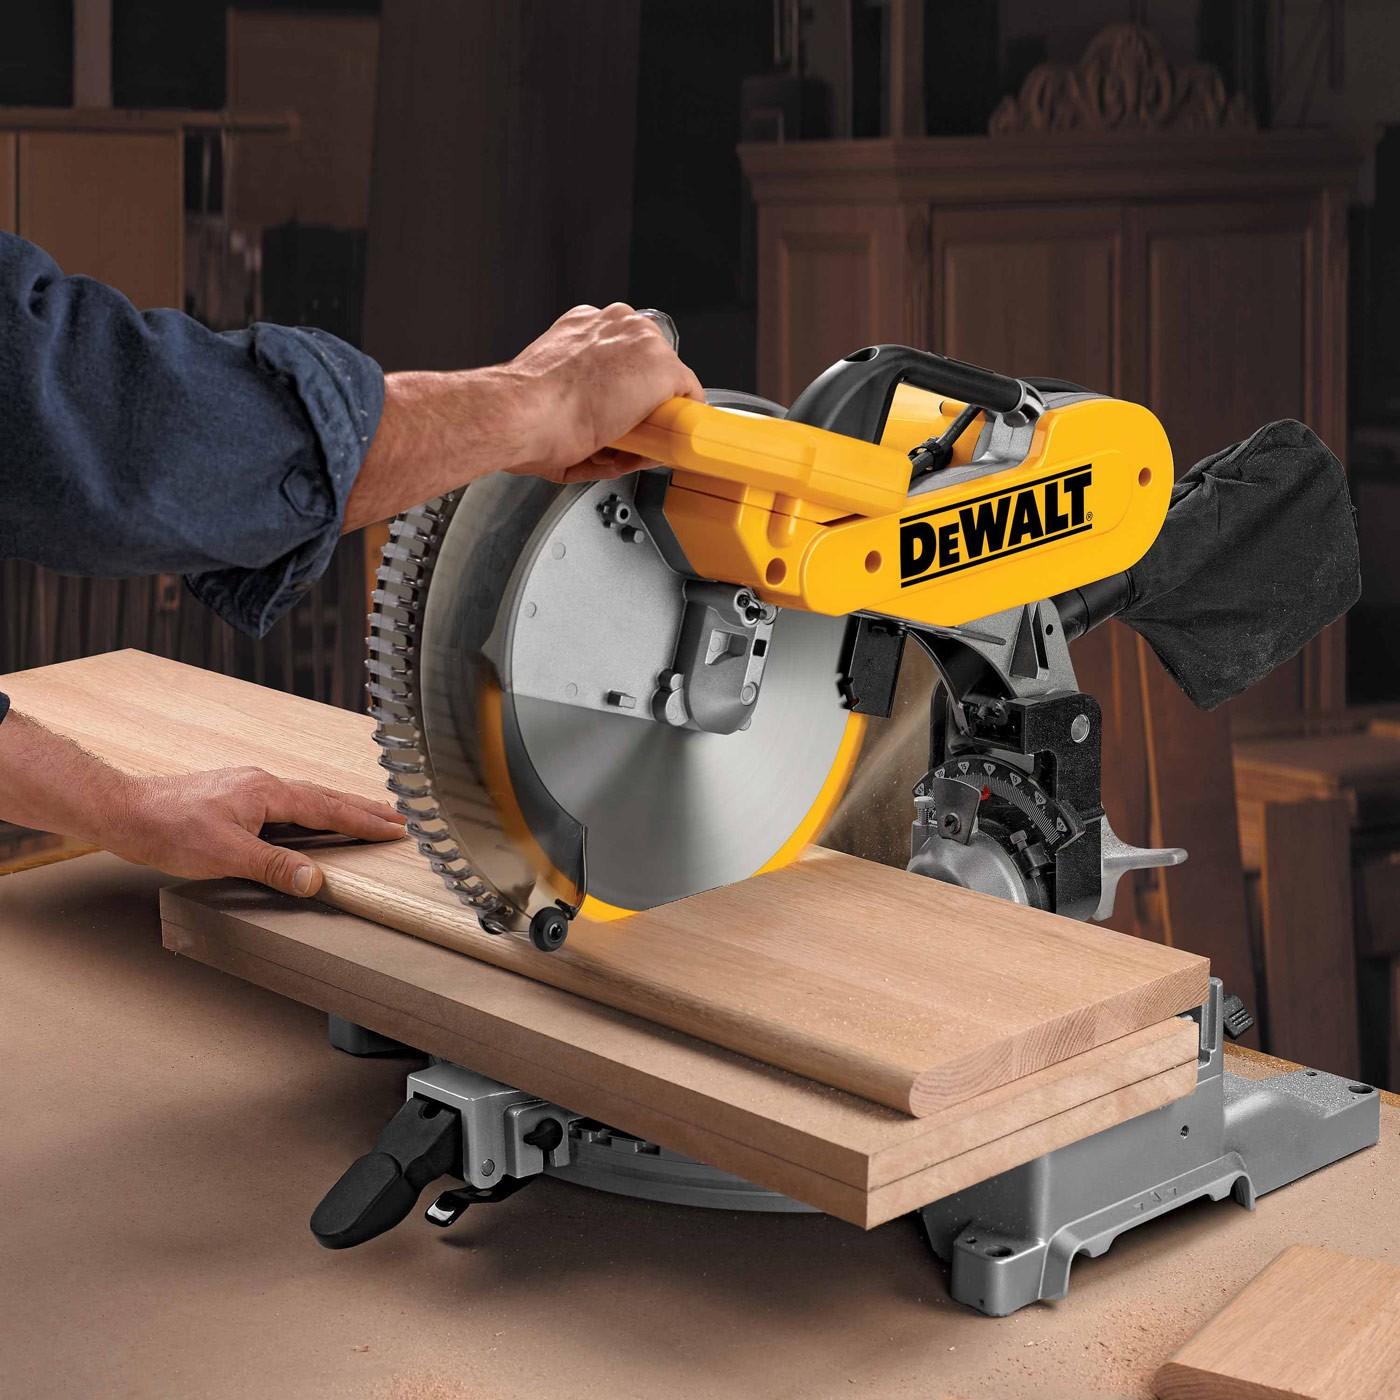 dewalt dw716 12 heavy duty double bevel compound miter saw. Black Bedroom Furniture Sets. Home Design Ideas